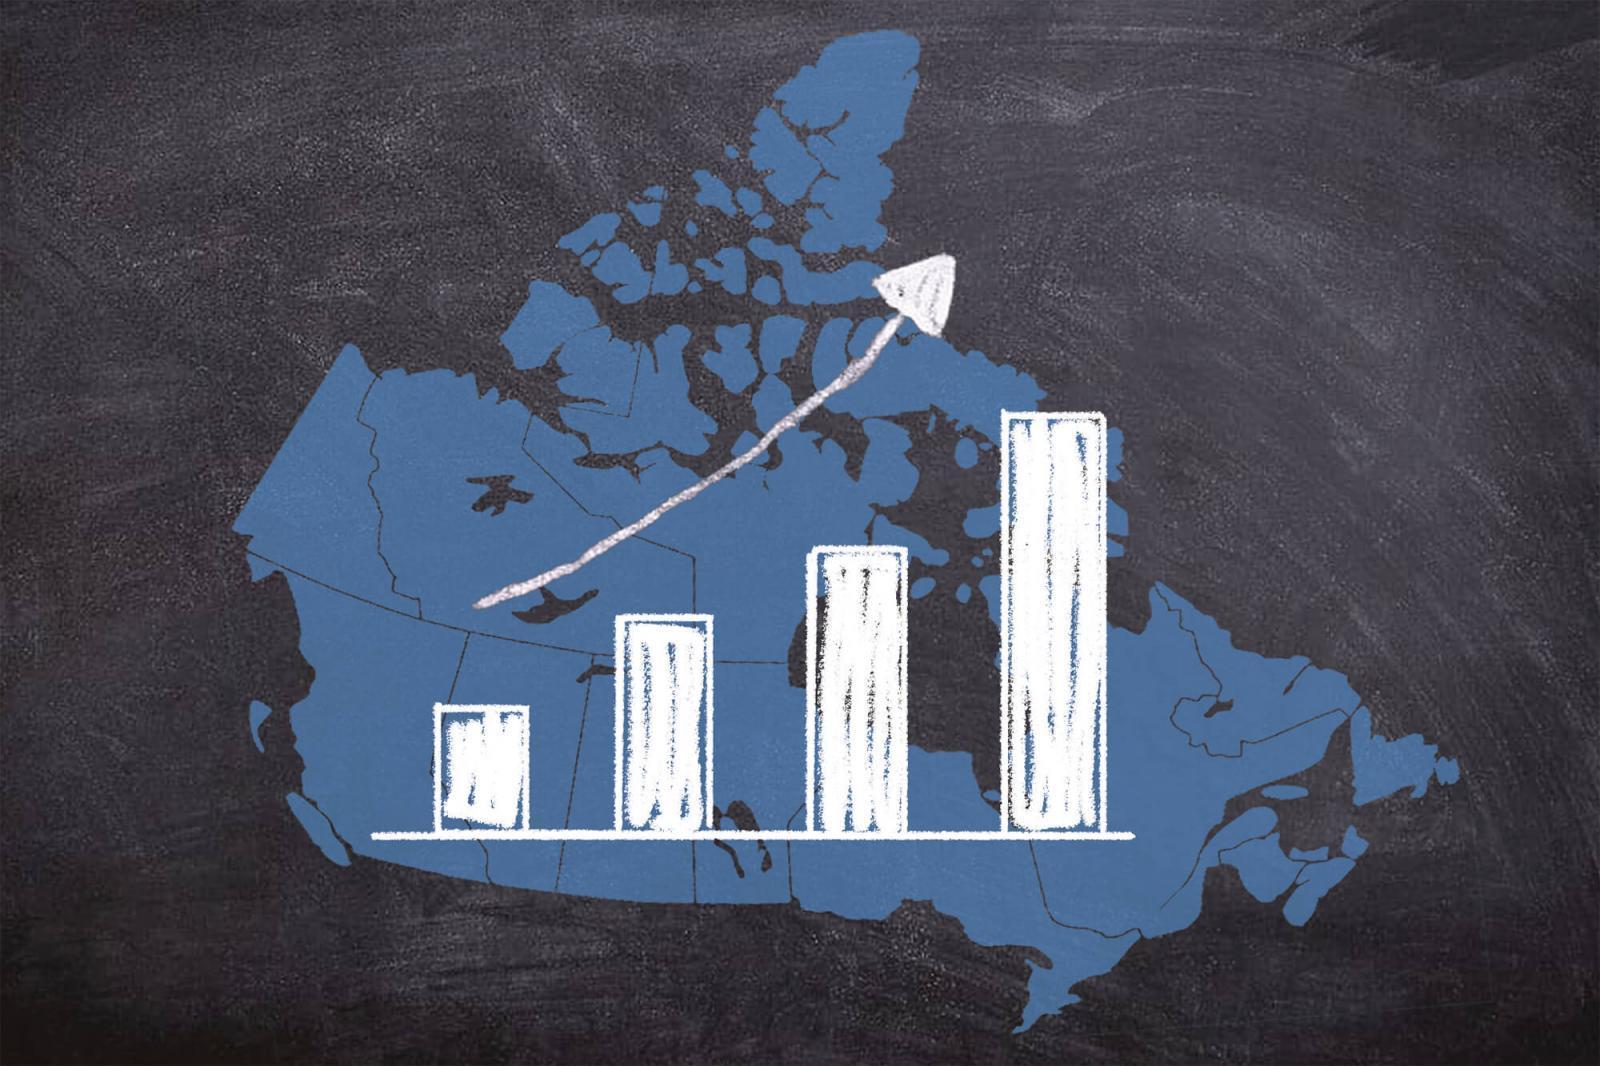 Insurance storm paralyzes Canada